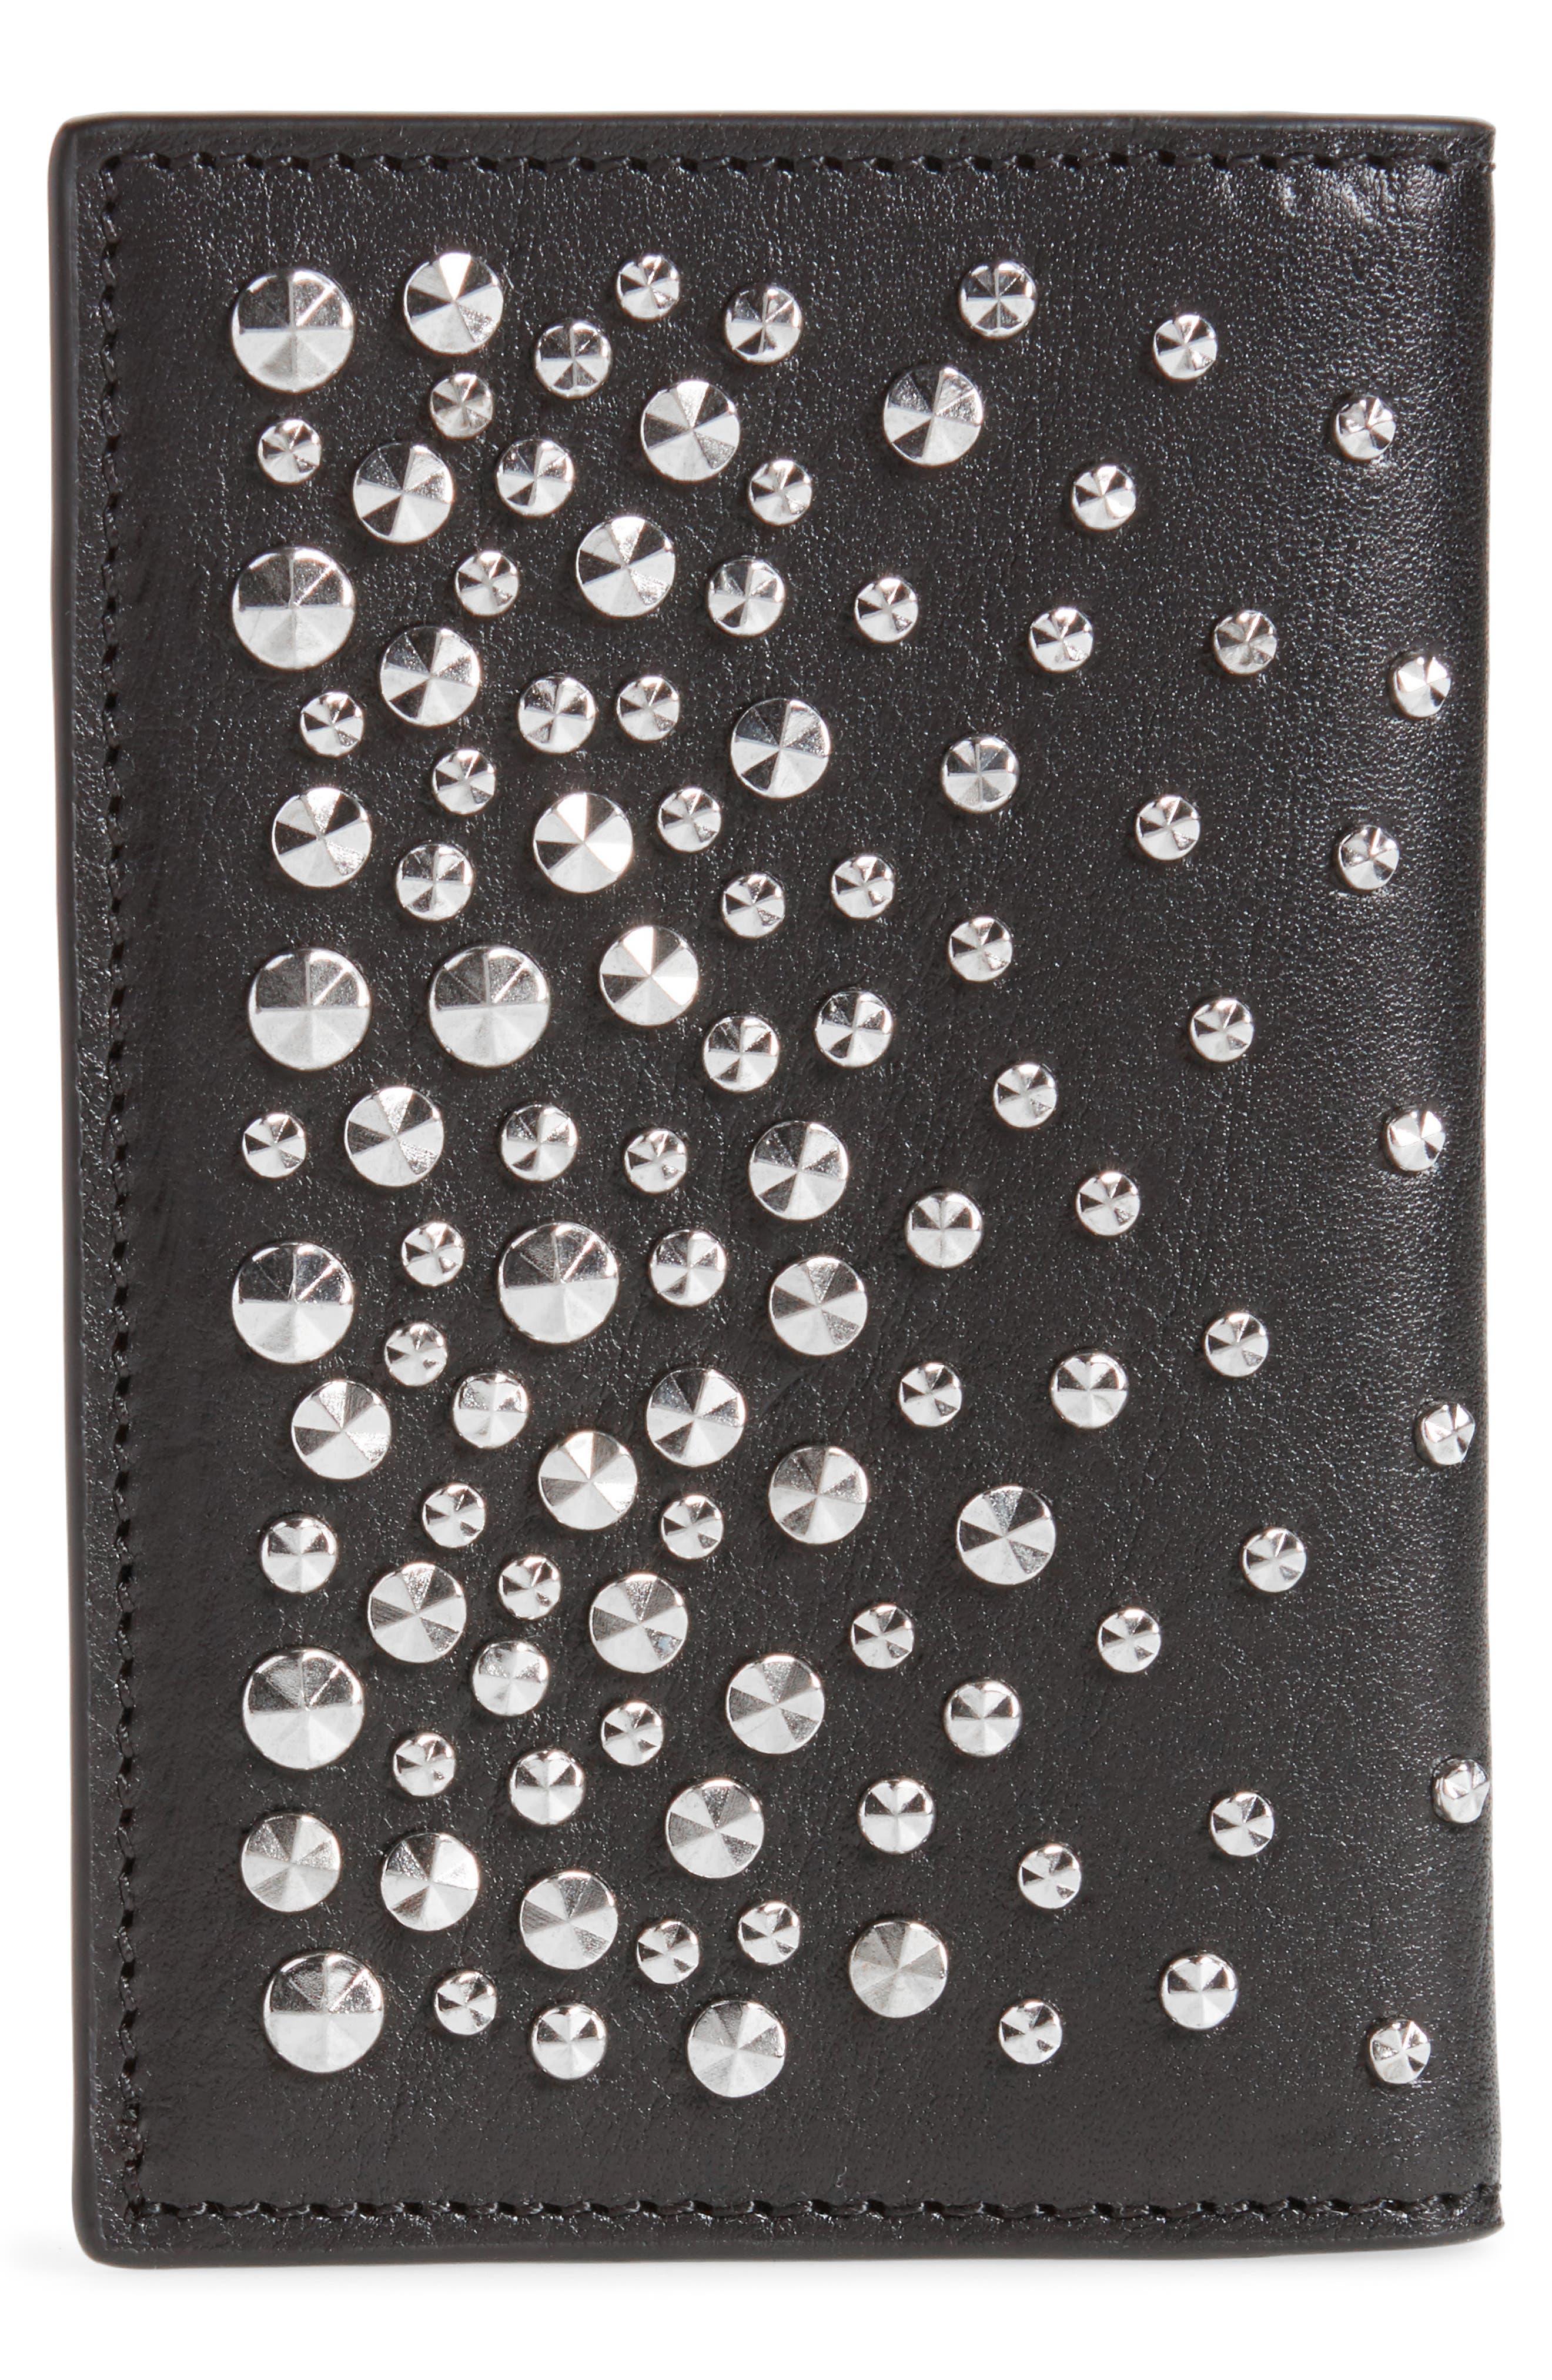 Studs & Skull Leather Card Case,                             Alternate thumbnail 3, color,                             001